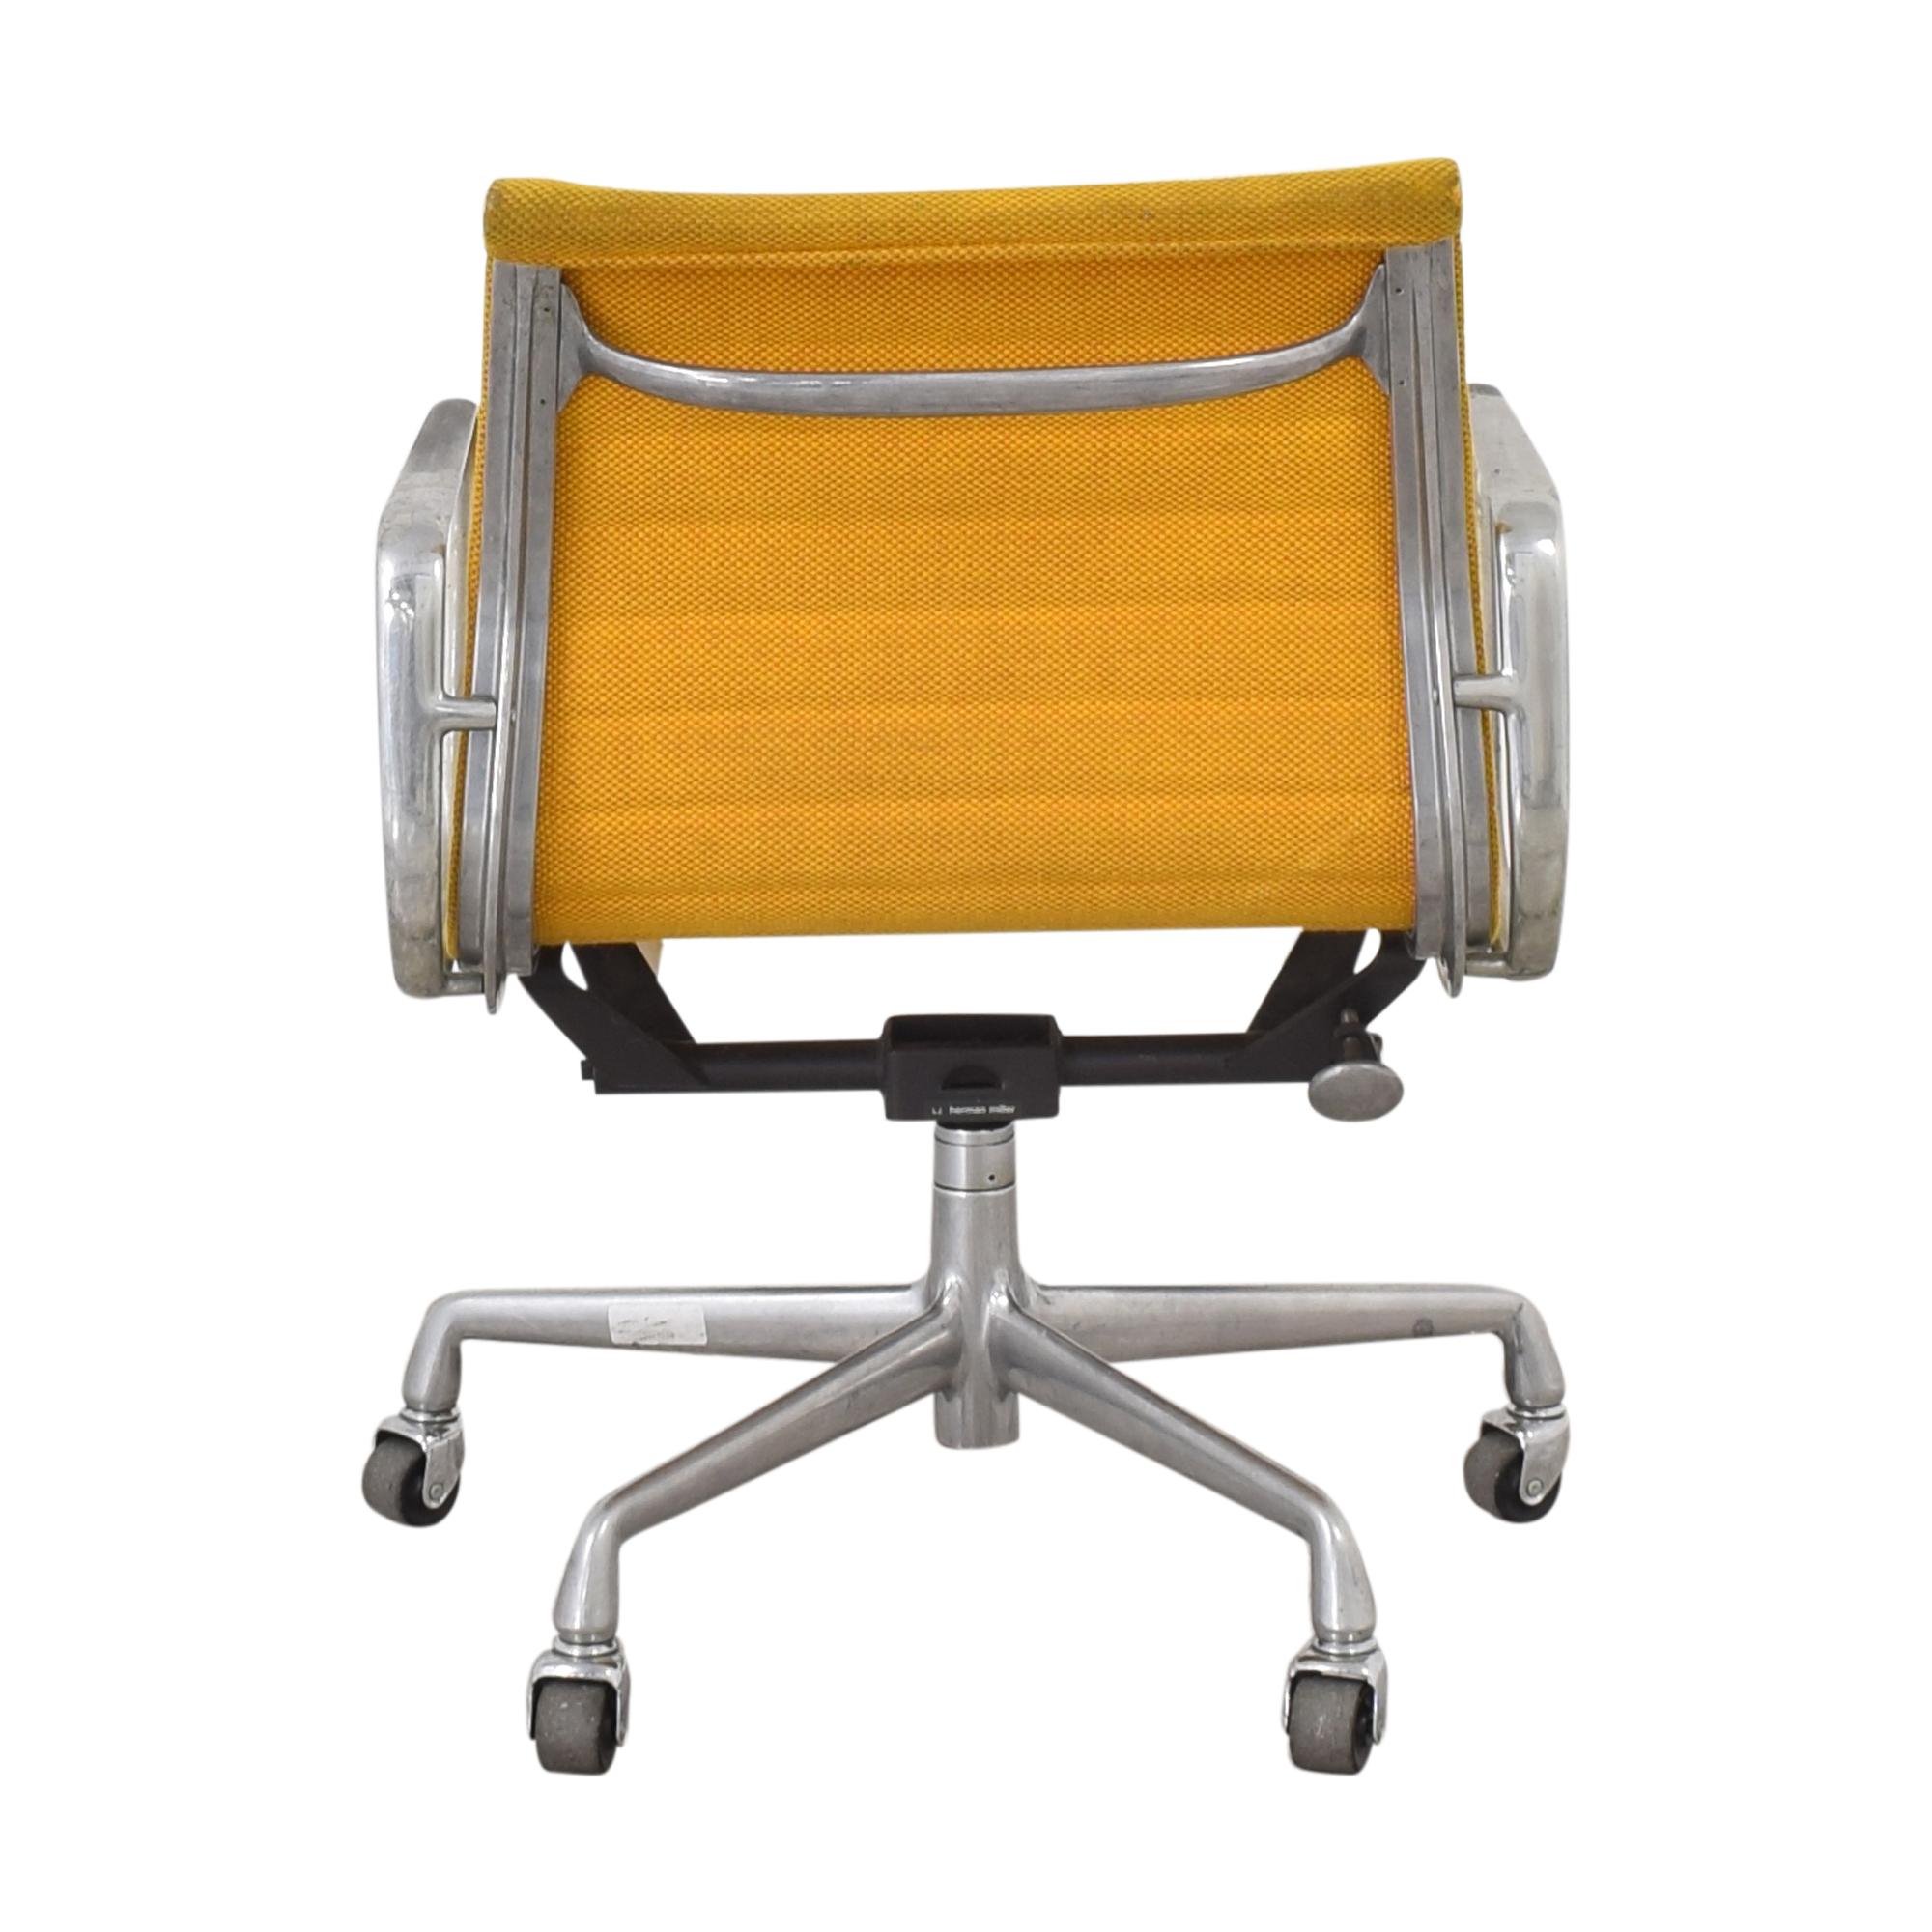 Herman Miller Herman Miller Eames Aluminum Group Management Chair used